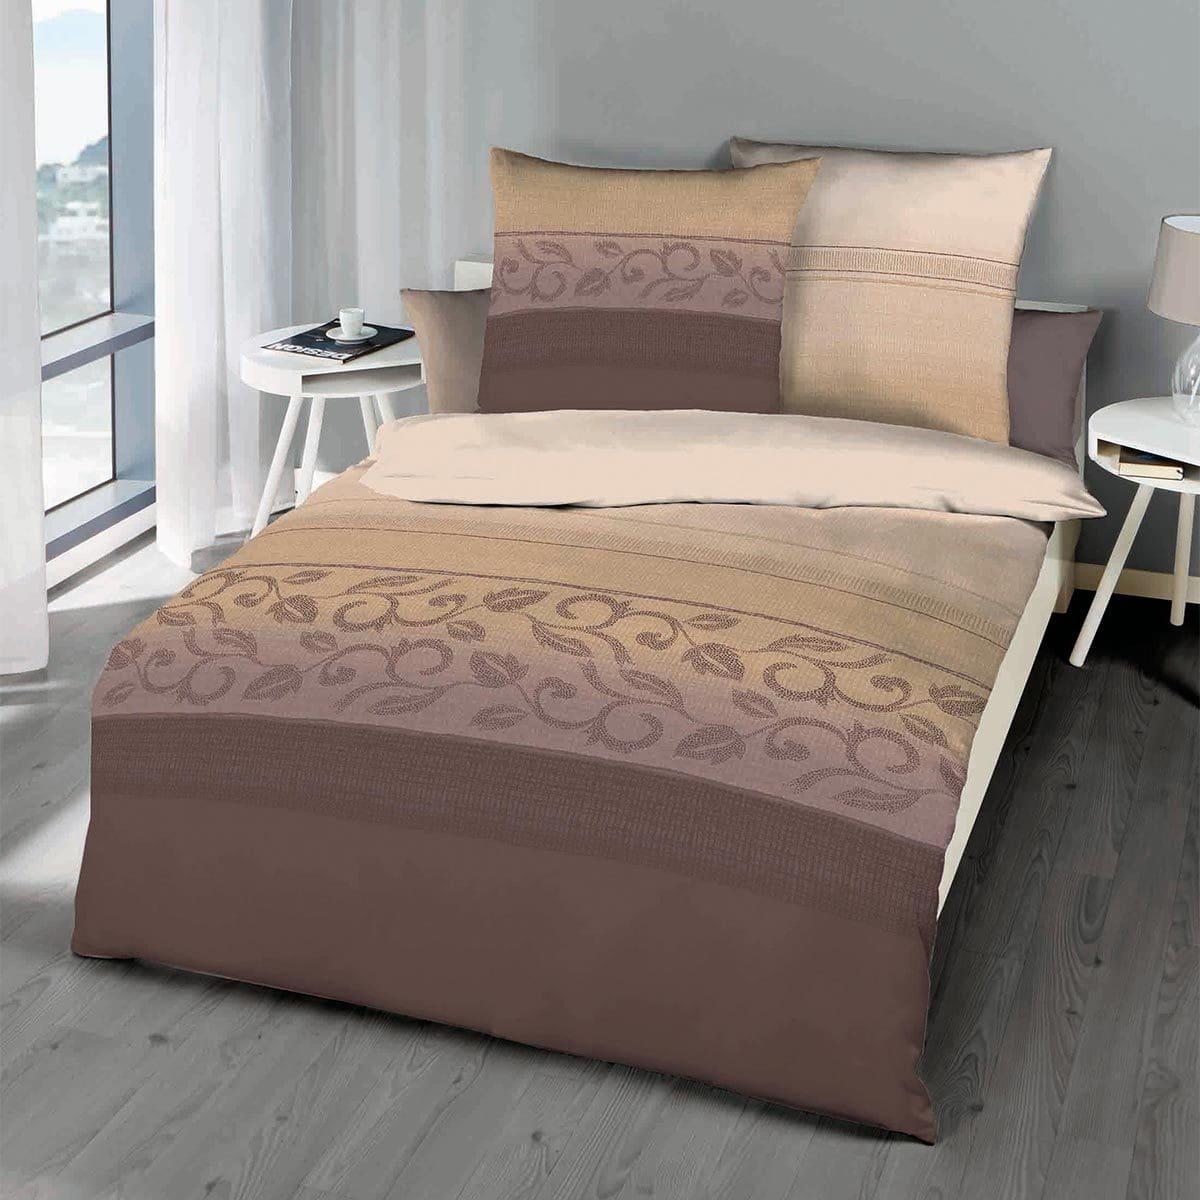 kaeppel mako satin bettw sche believe mauve g nstig online kaufen bei bettwaren shop. Black Bedroom Furniture Sets. Home Design Ideas